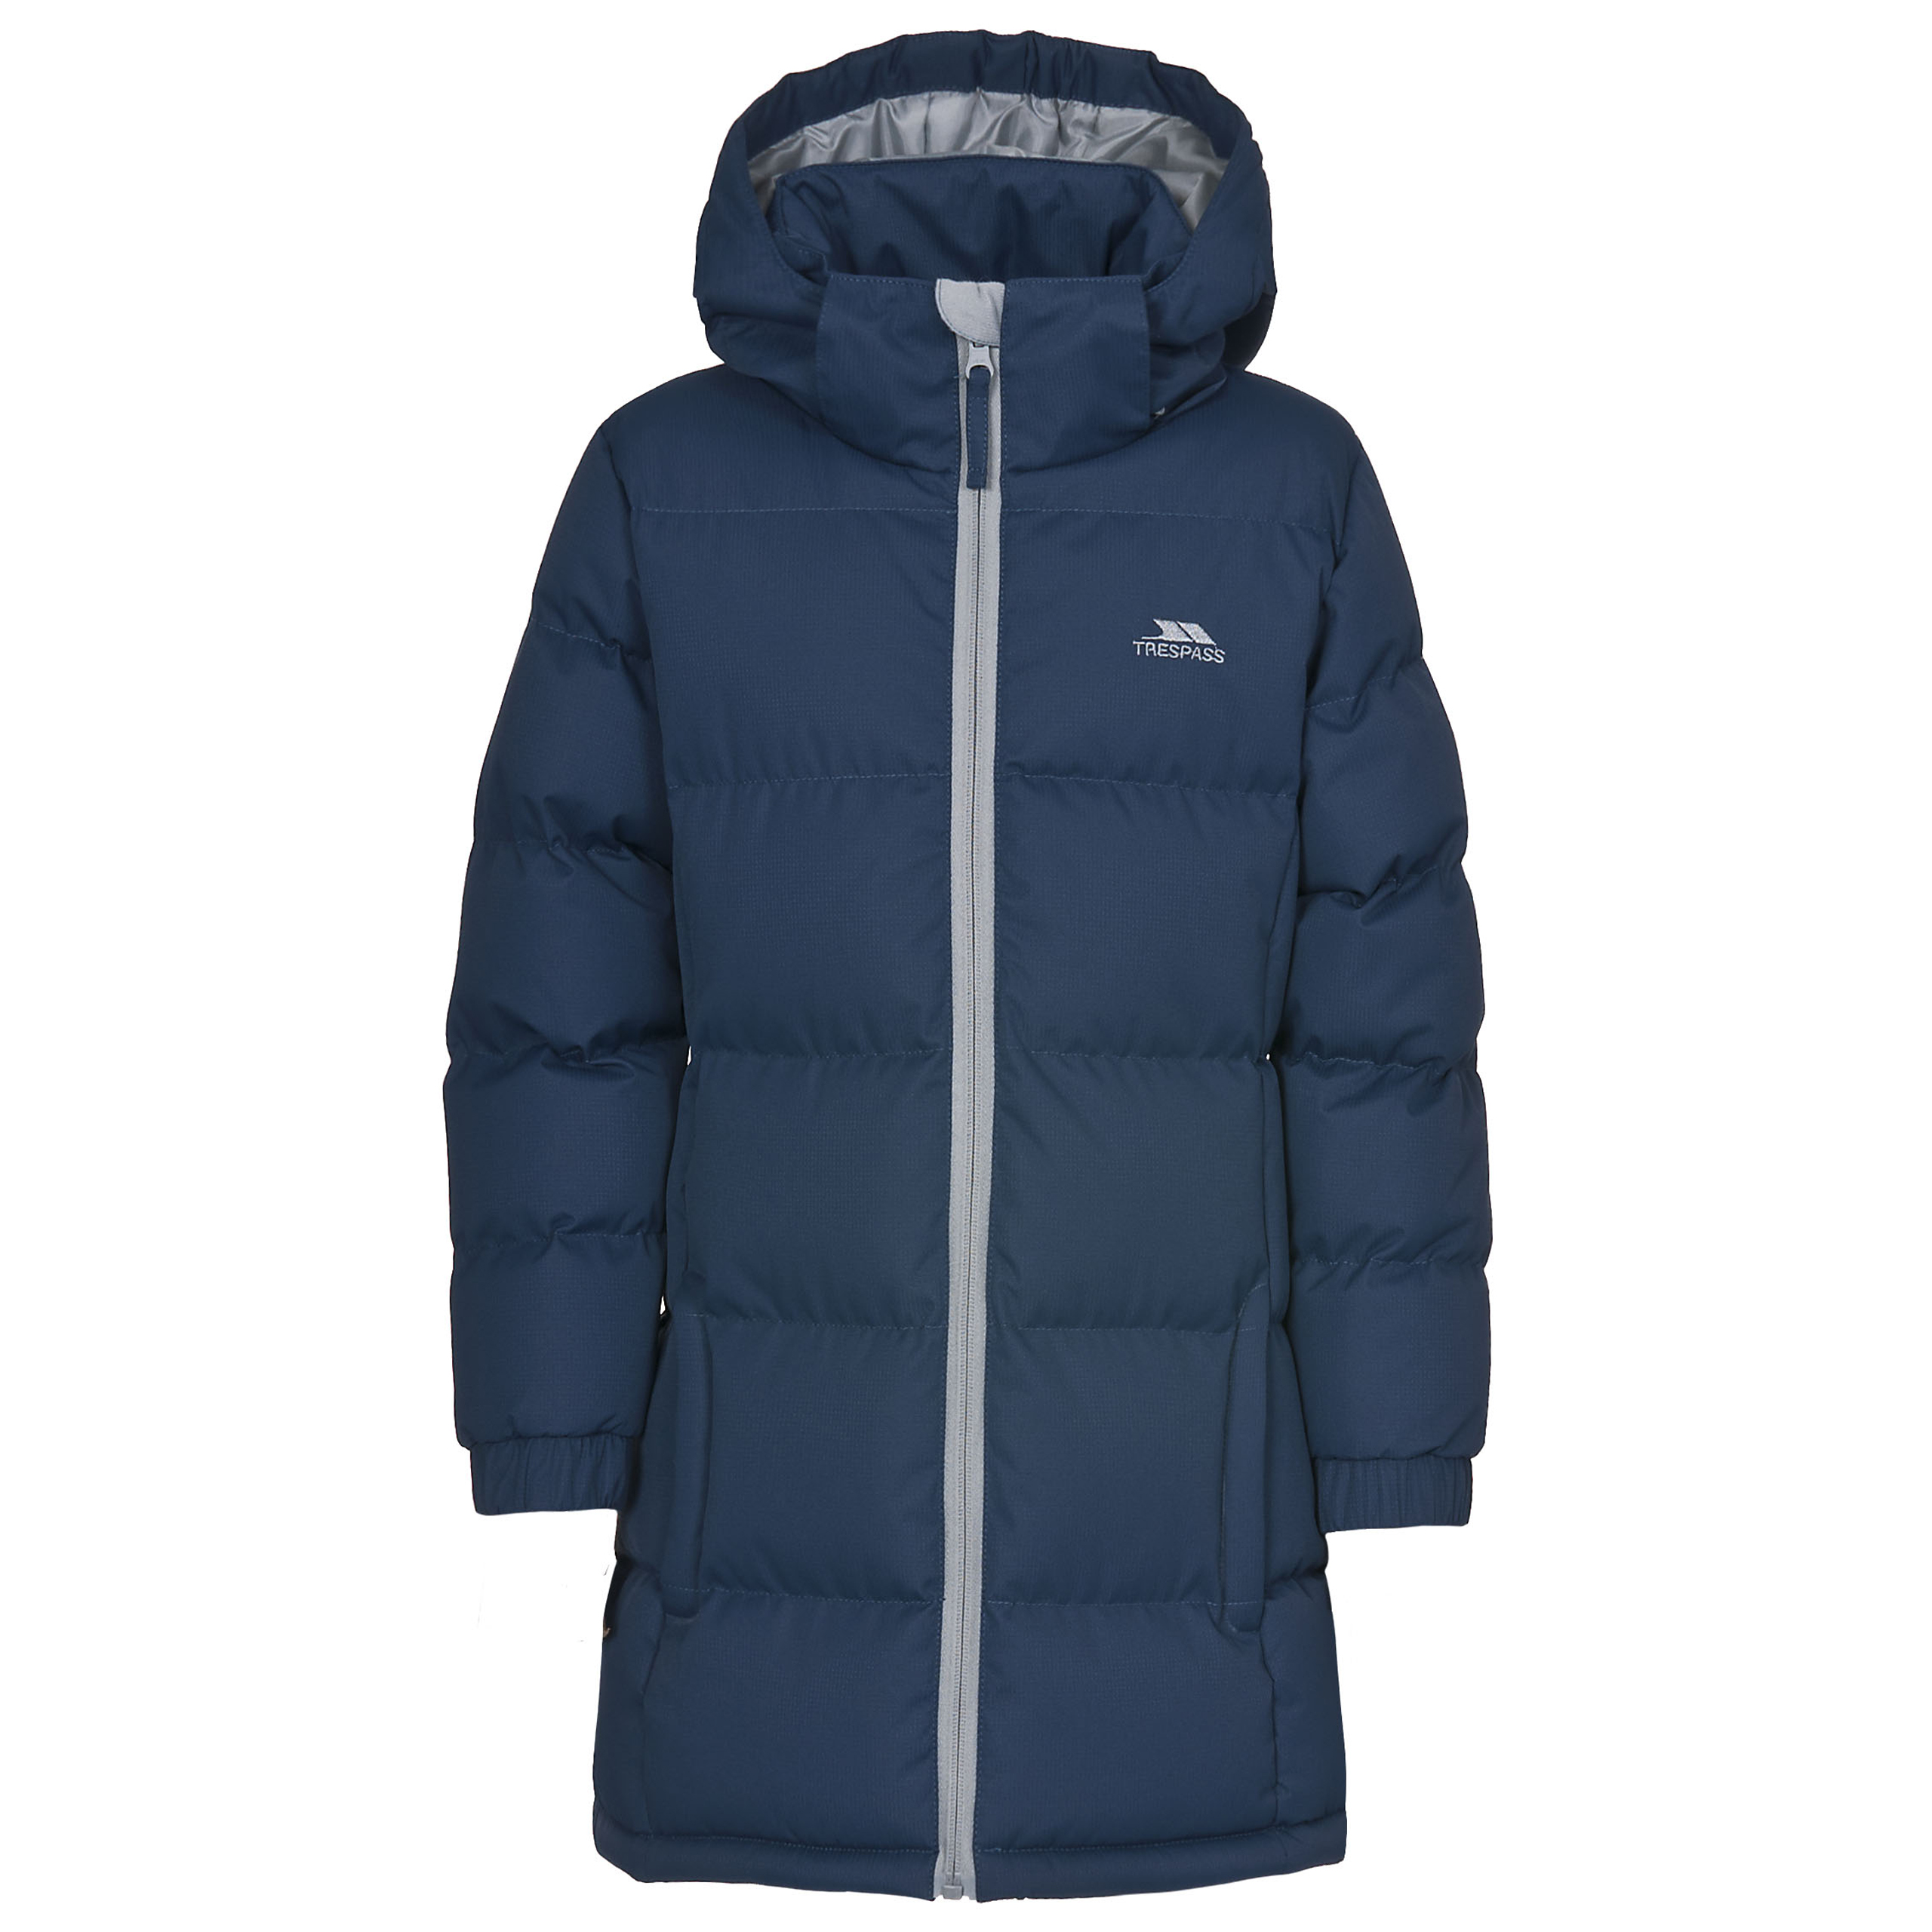 Trespass-Tiffy-Girls-Winter-Coat-Padded-Casual-Longer-Length-amp-Insulated-Jacket thumbnail 17